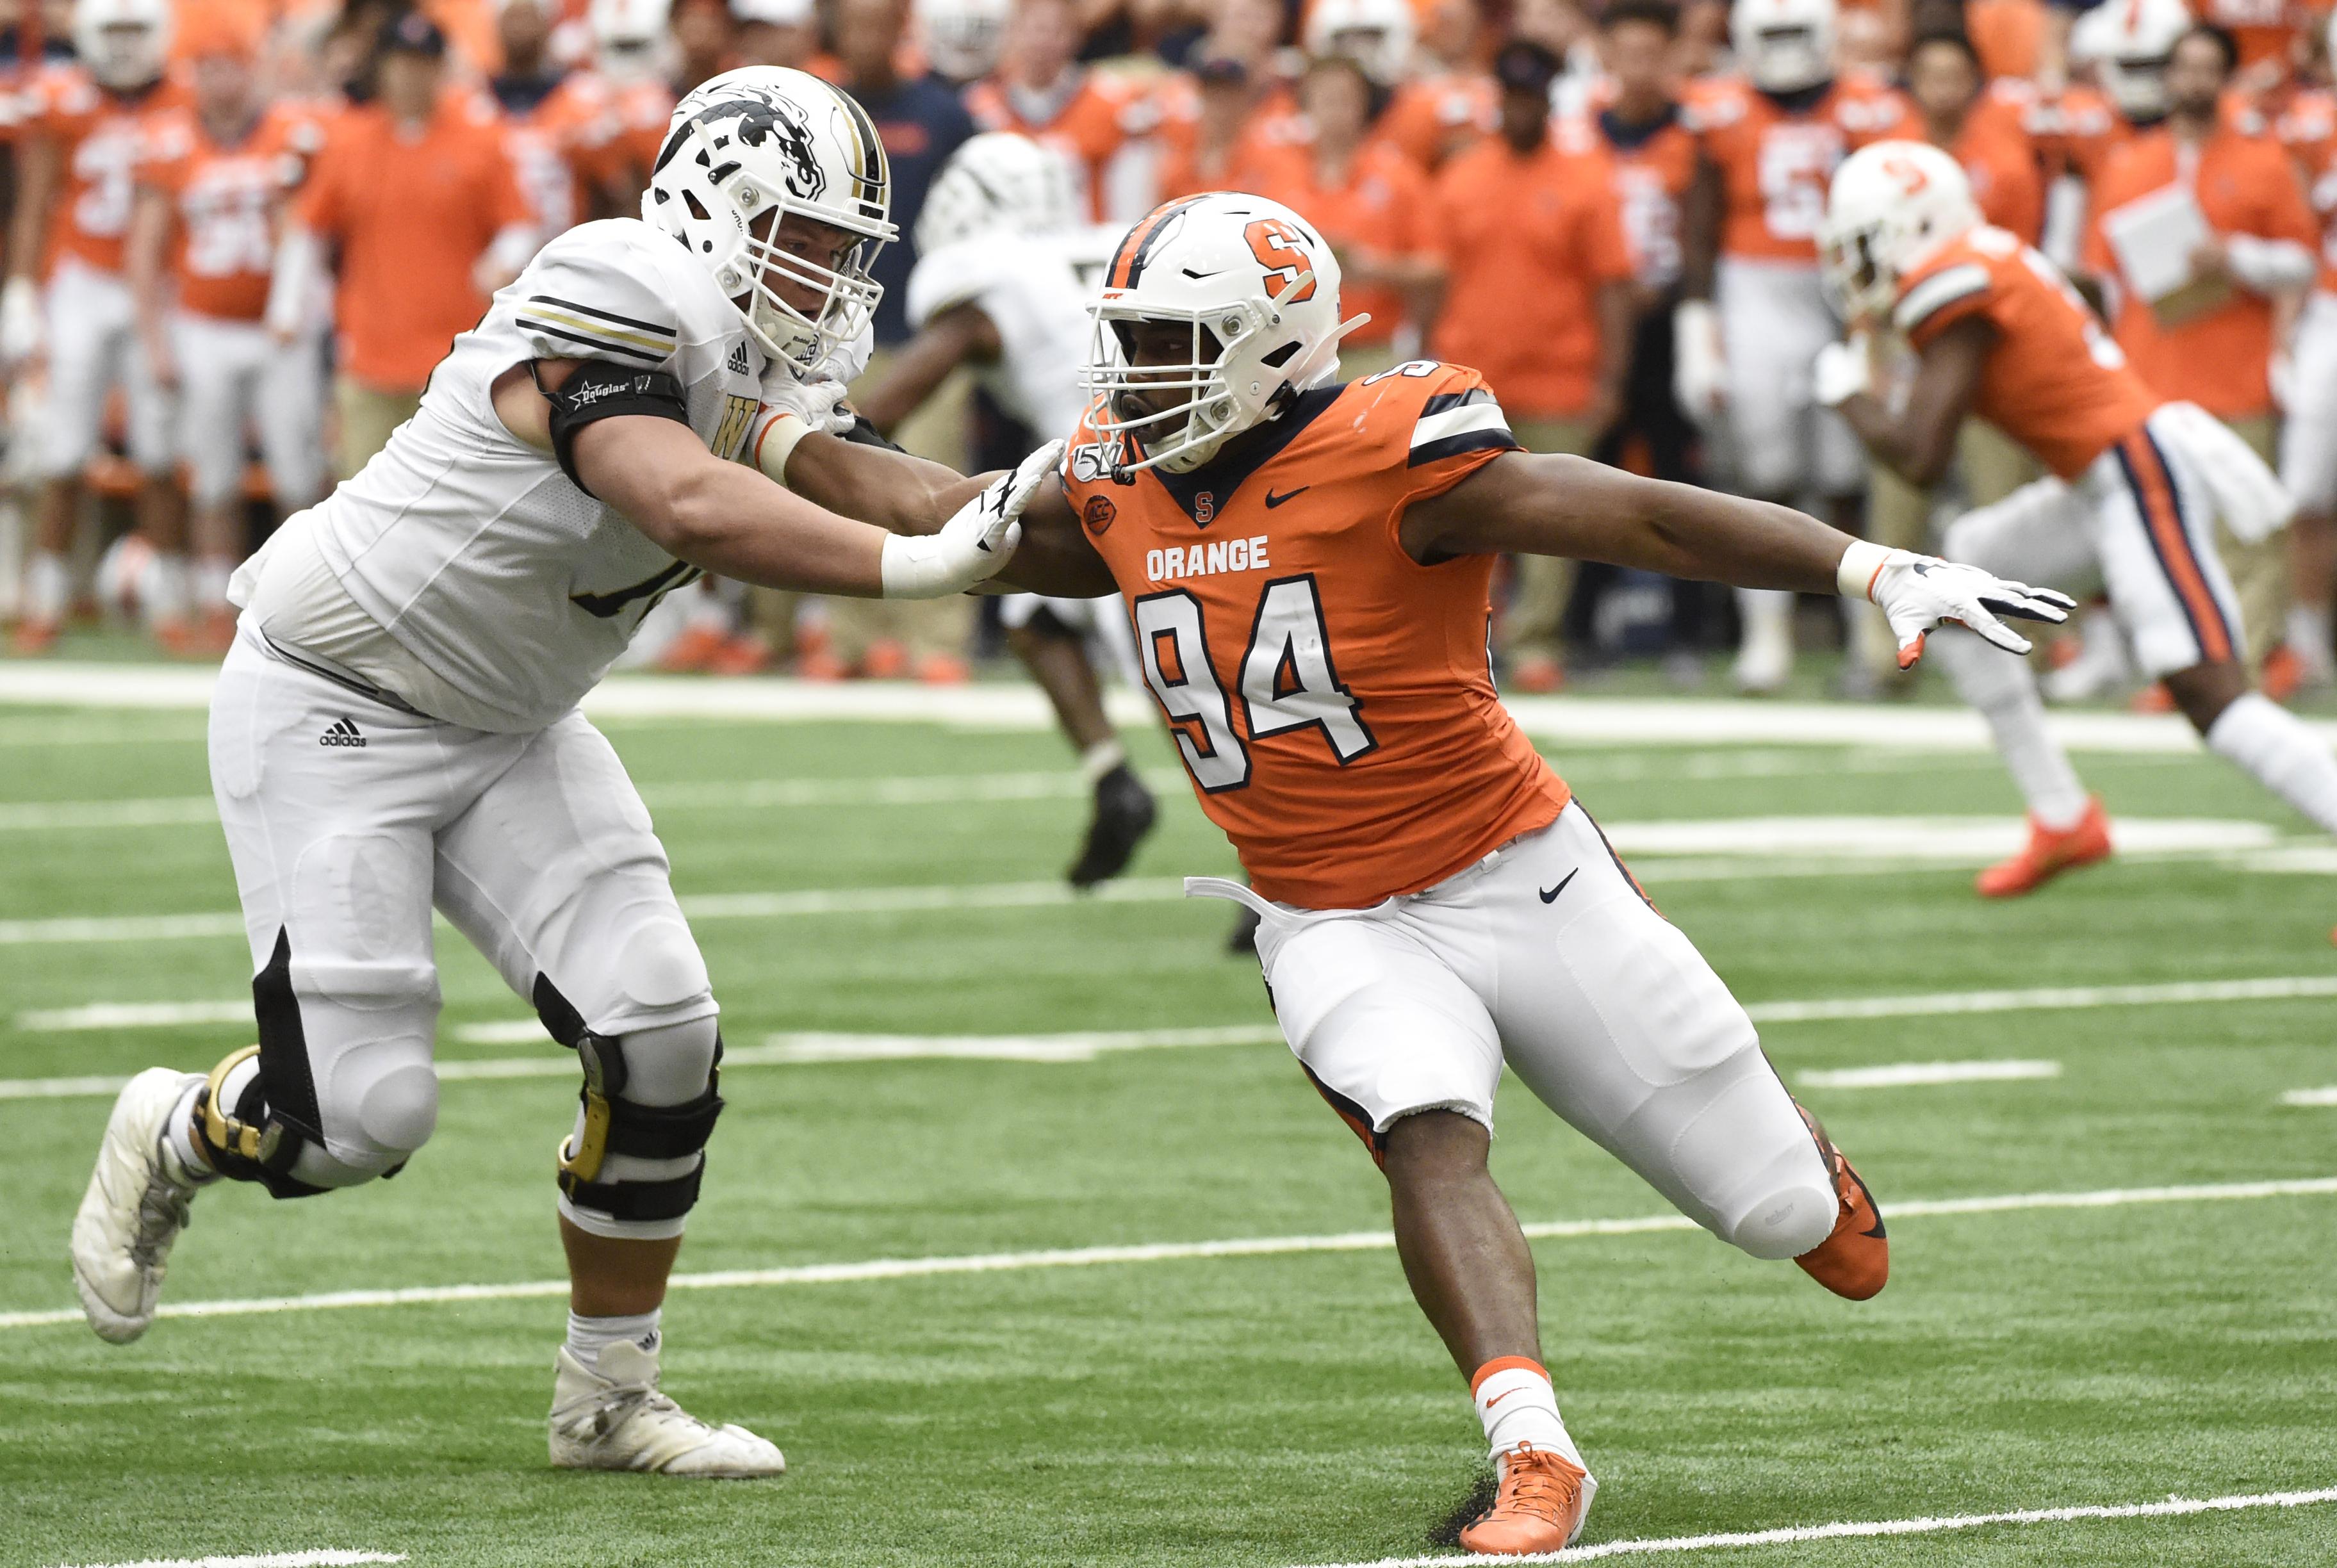 Syracuse football's Alton Robinson a first-round pick in CBS' mock NFL Draft